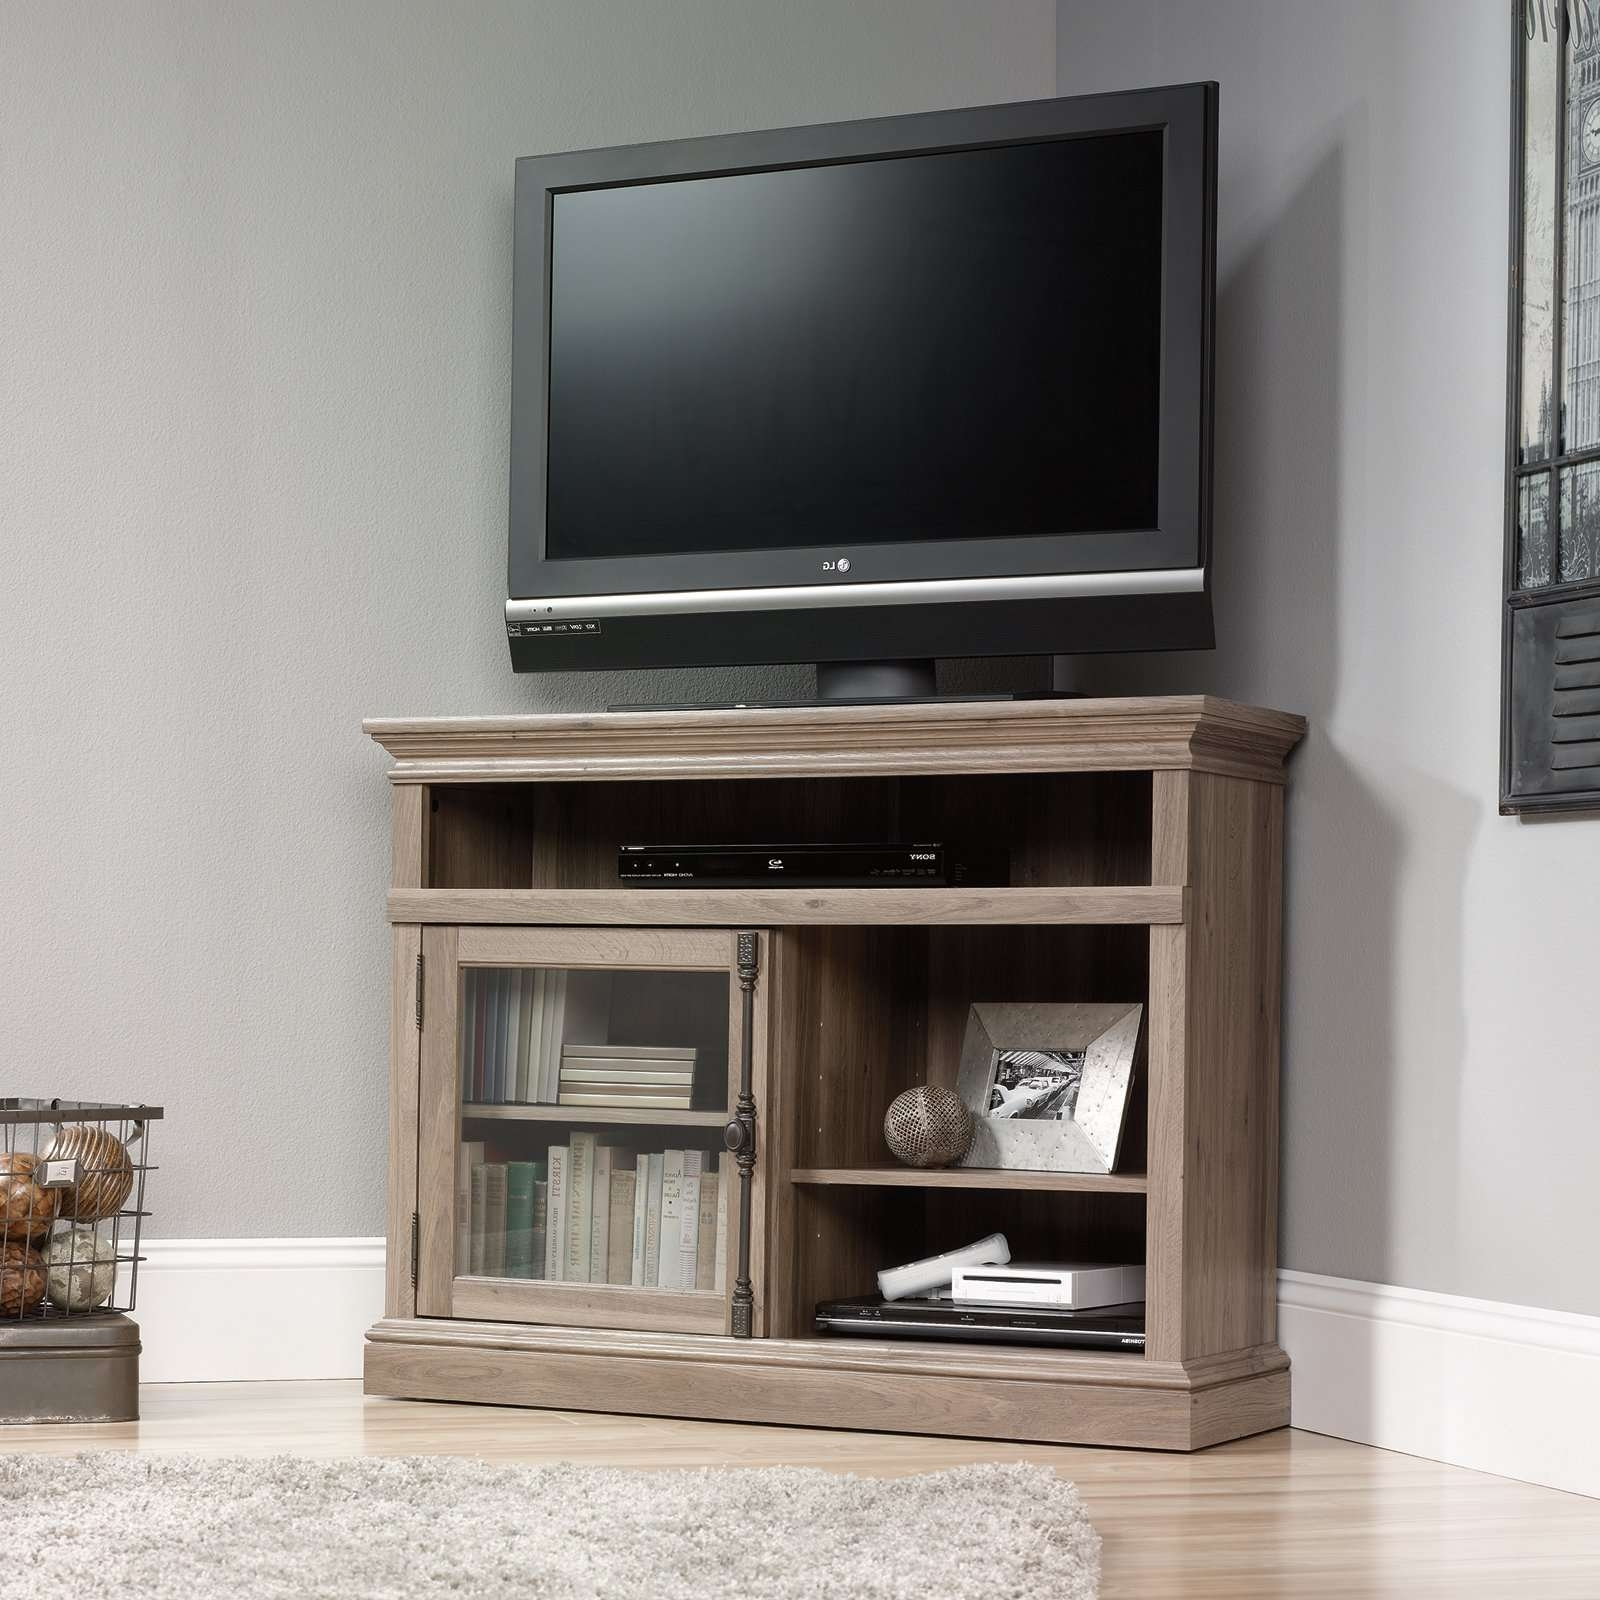 Tv : Cheap Oak Tv Stands Alluring Oak Tv Stand Second Hand Inside Cheap Oak Tv Stands (View 10 of 15)